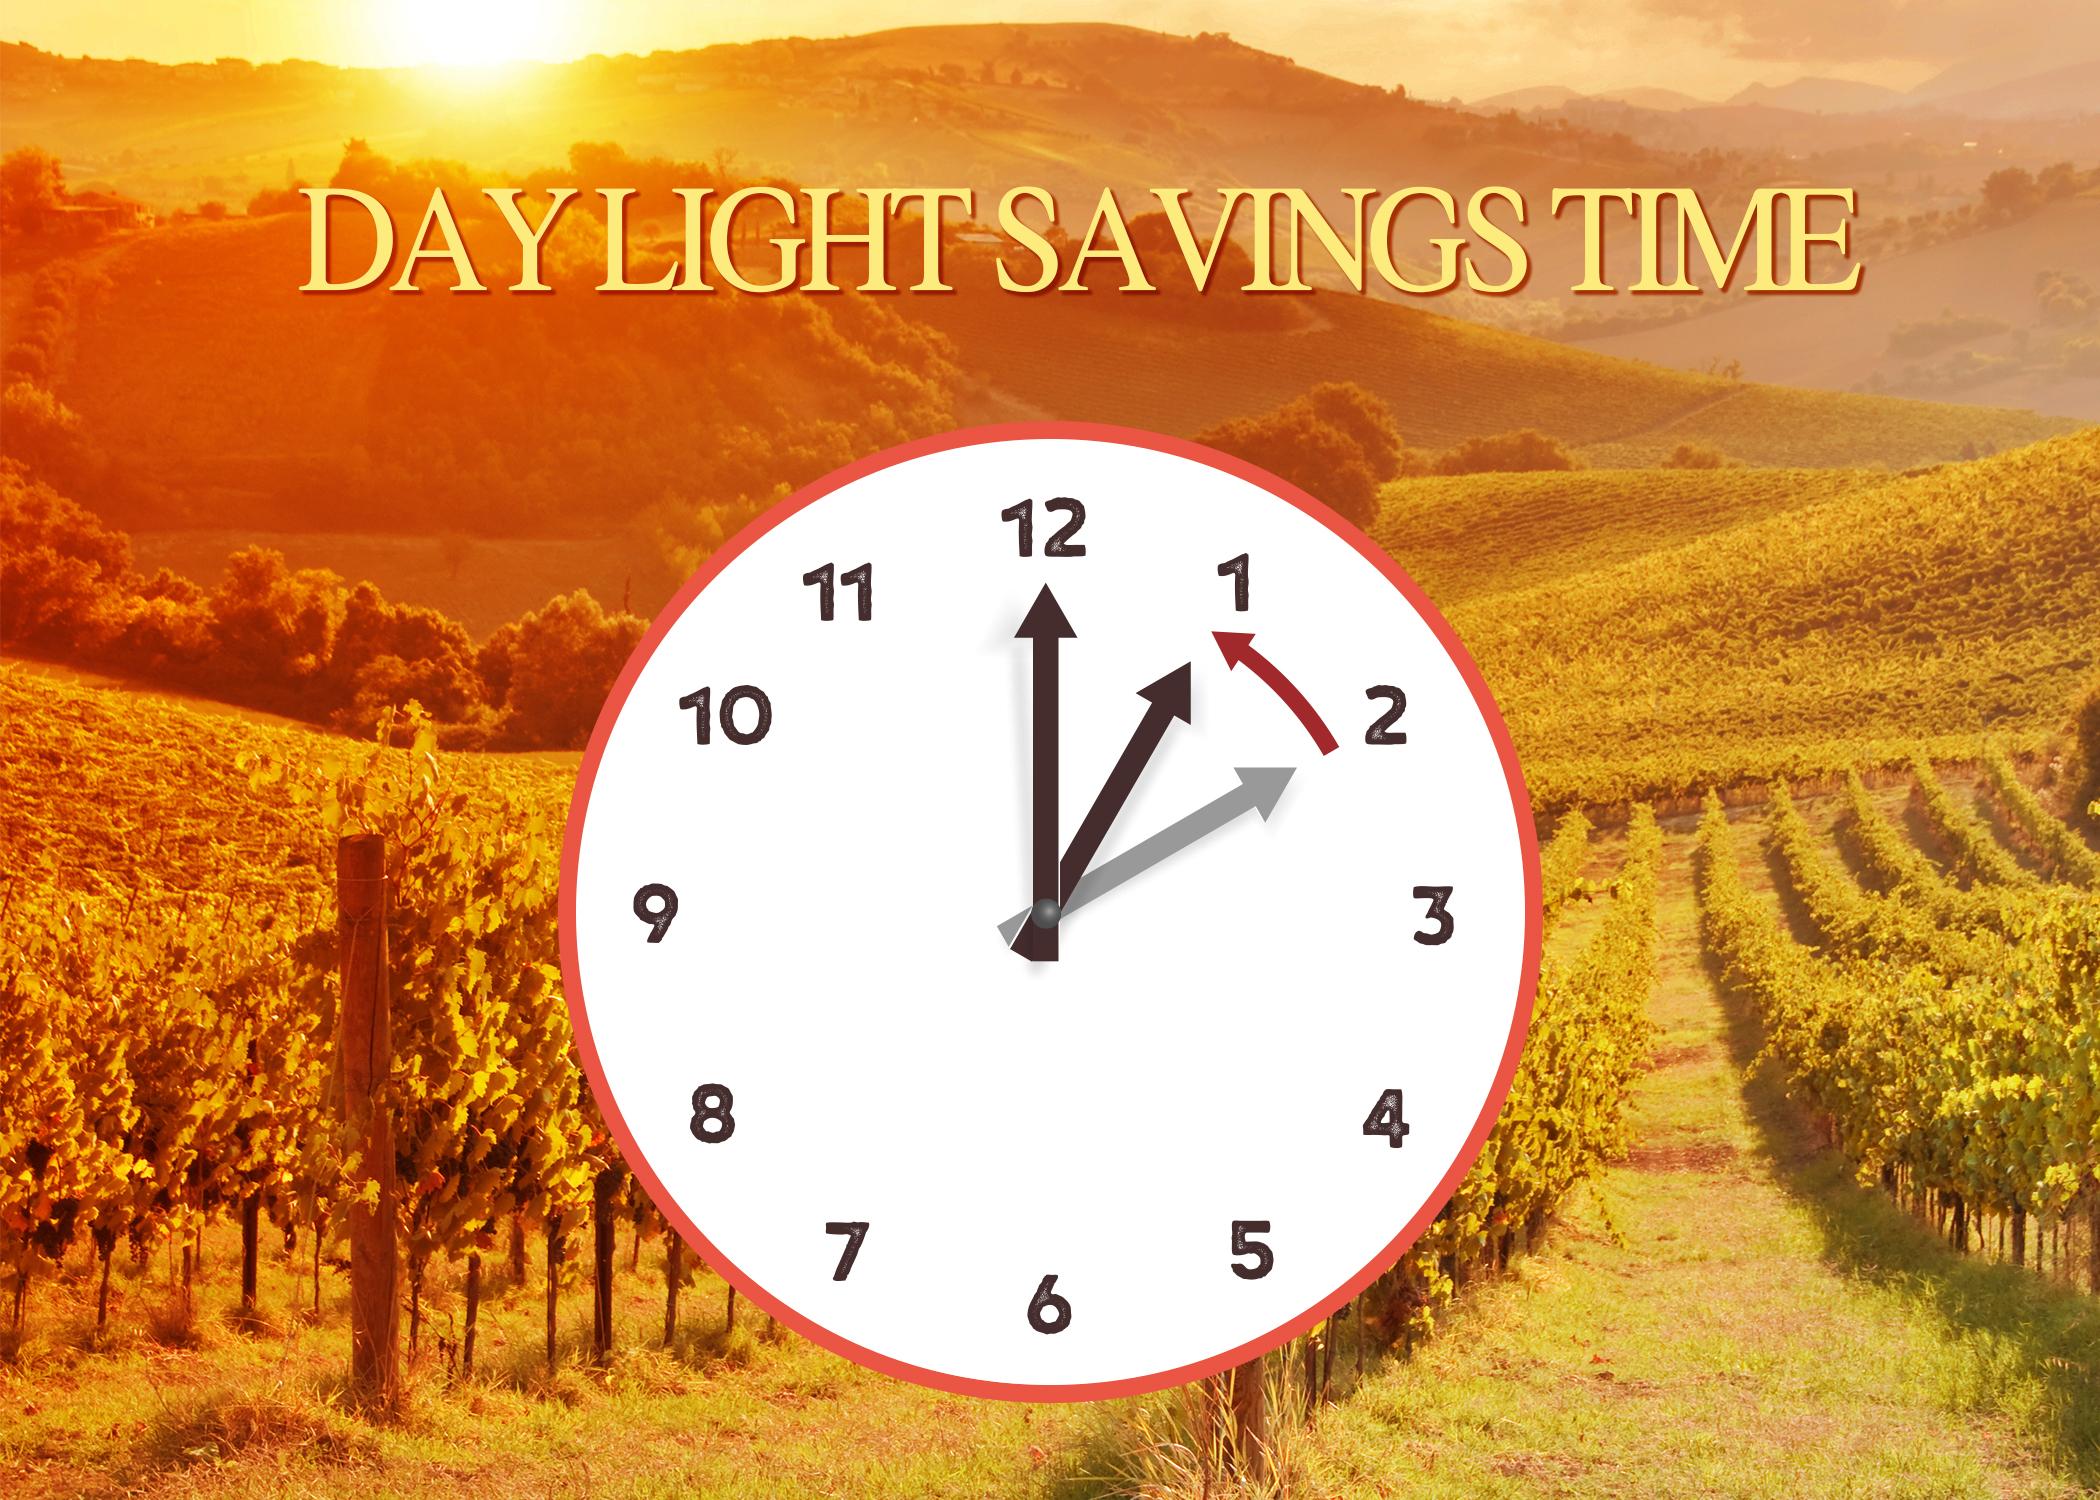 Daylight Savings Time Ends at 2am Motzei Shabbos